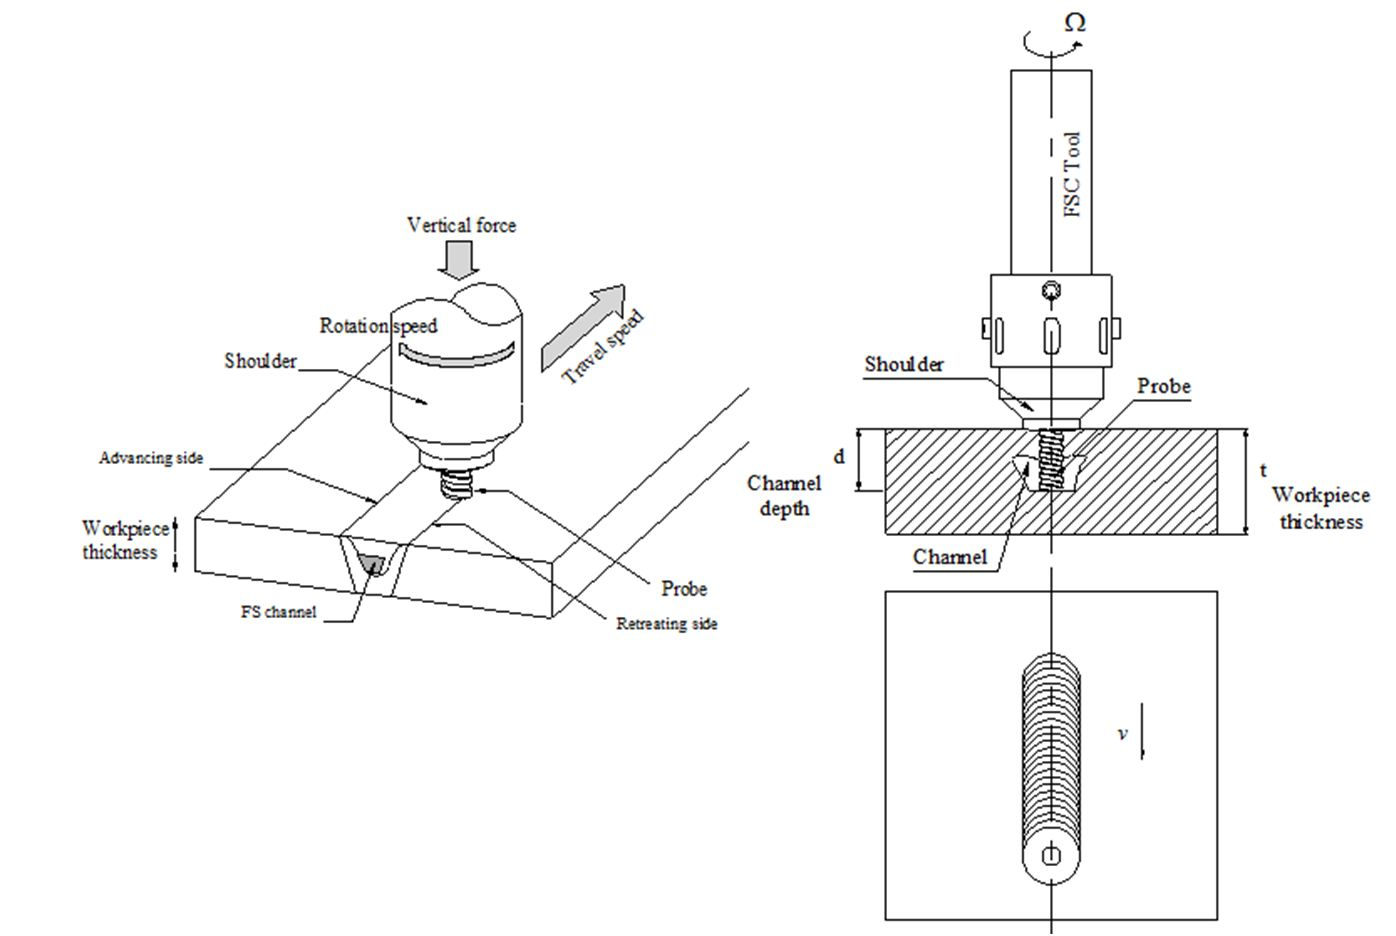 hight resolution of figure 22 schematic representation